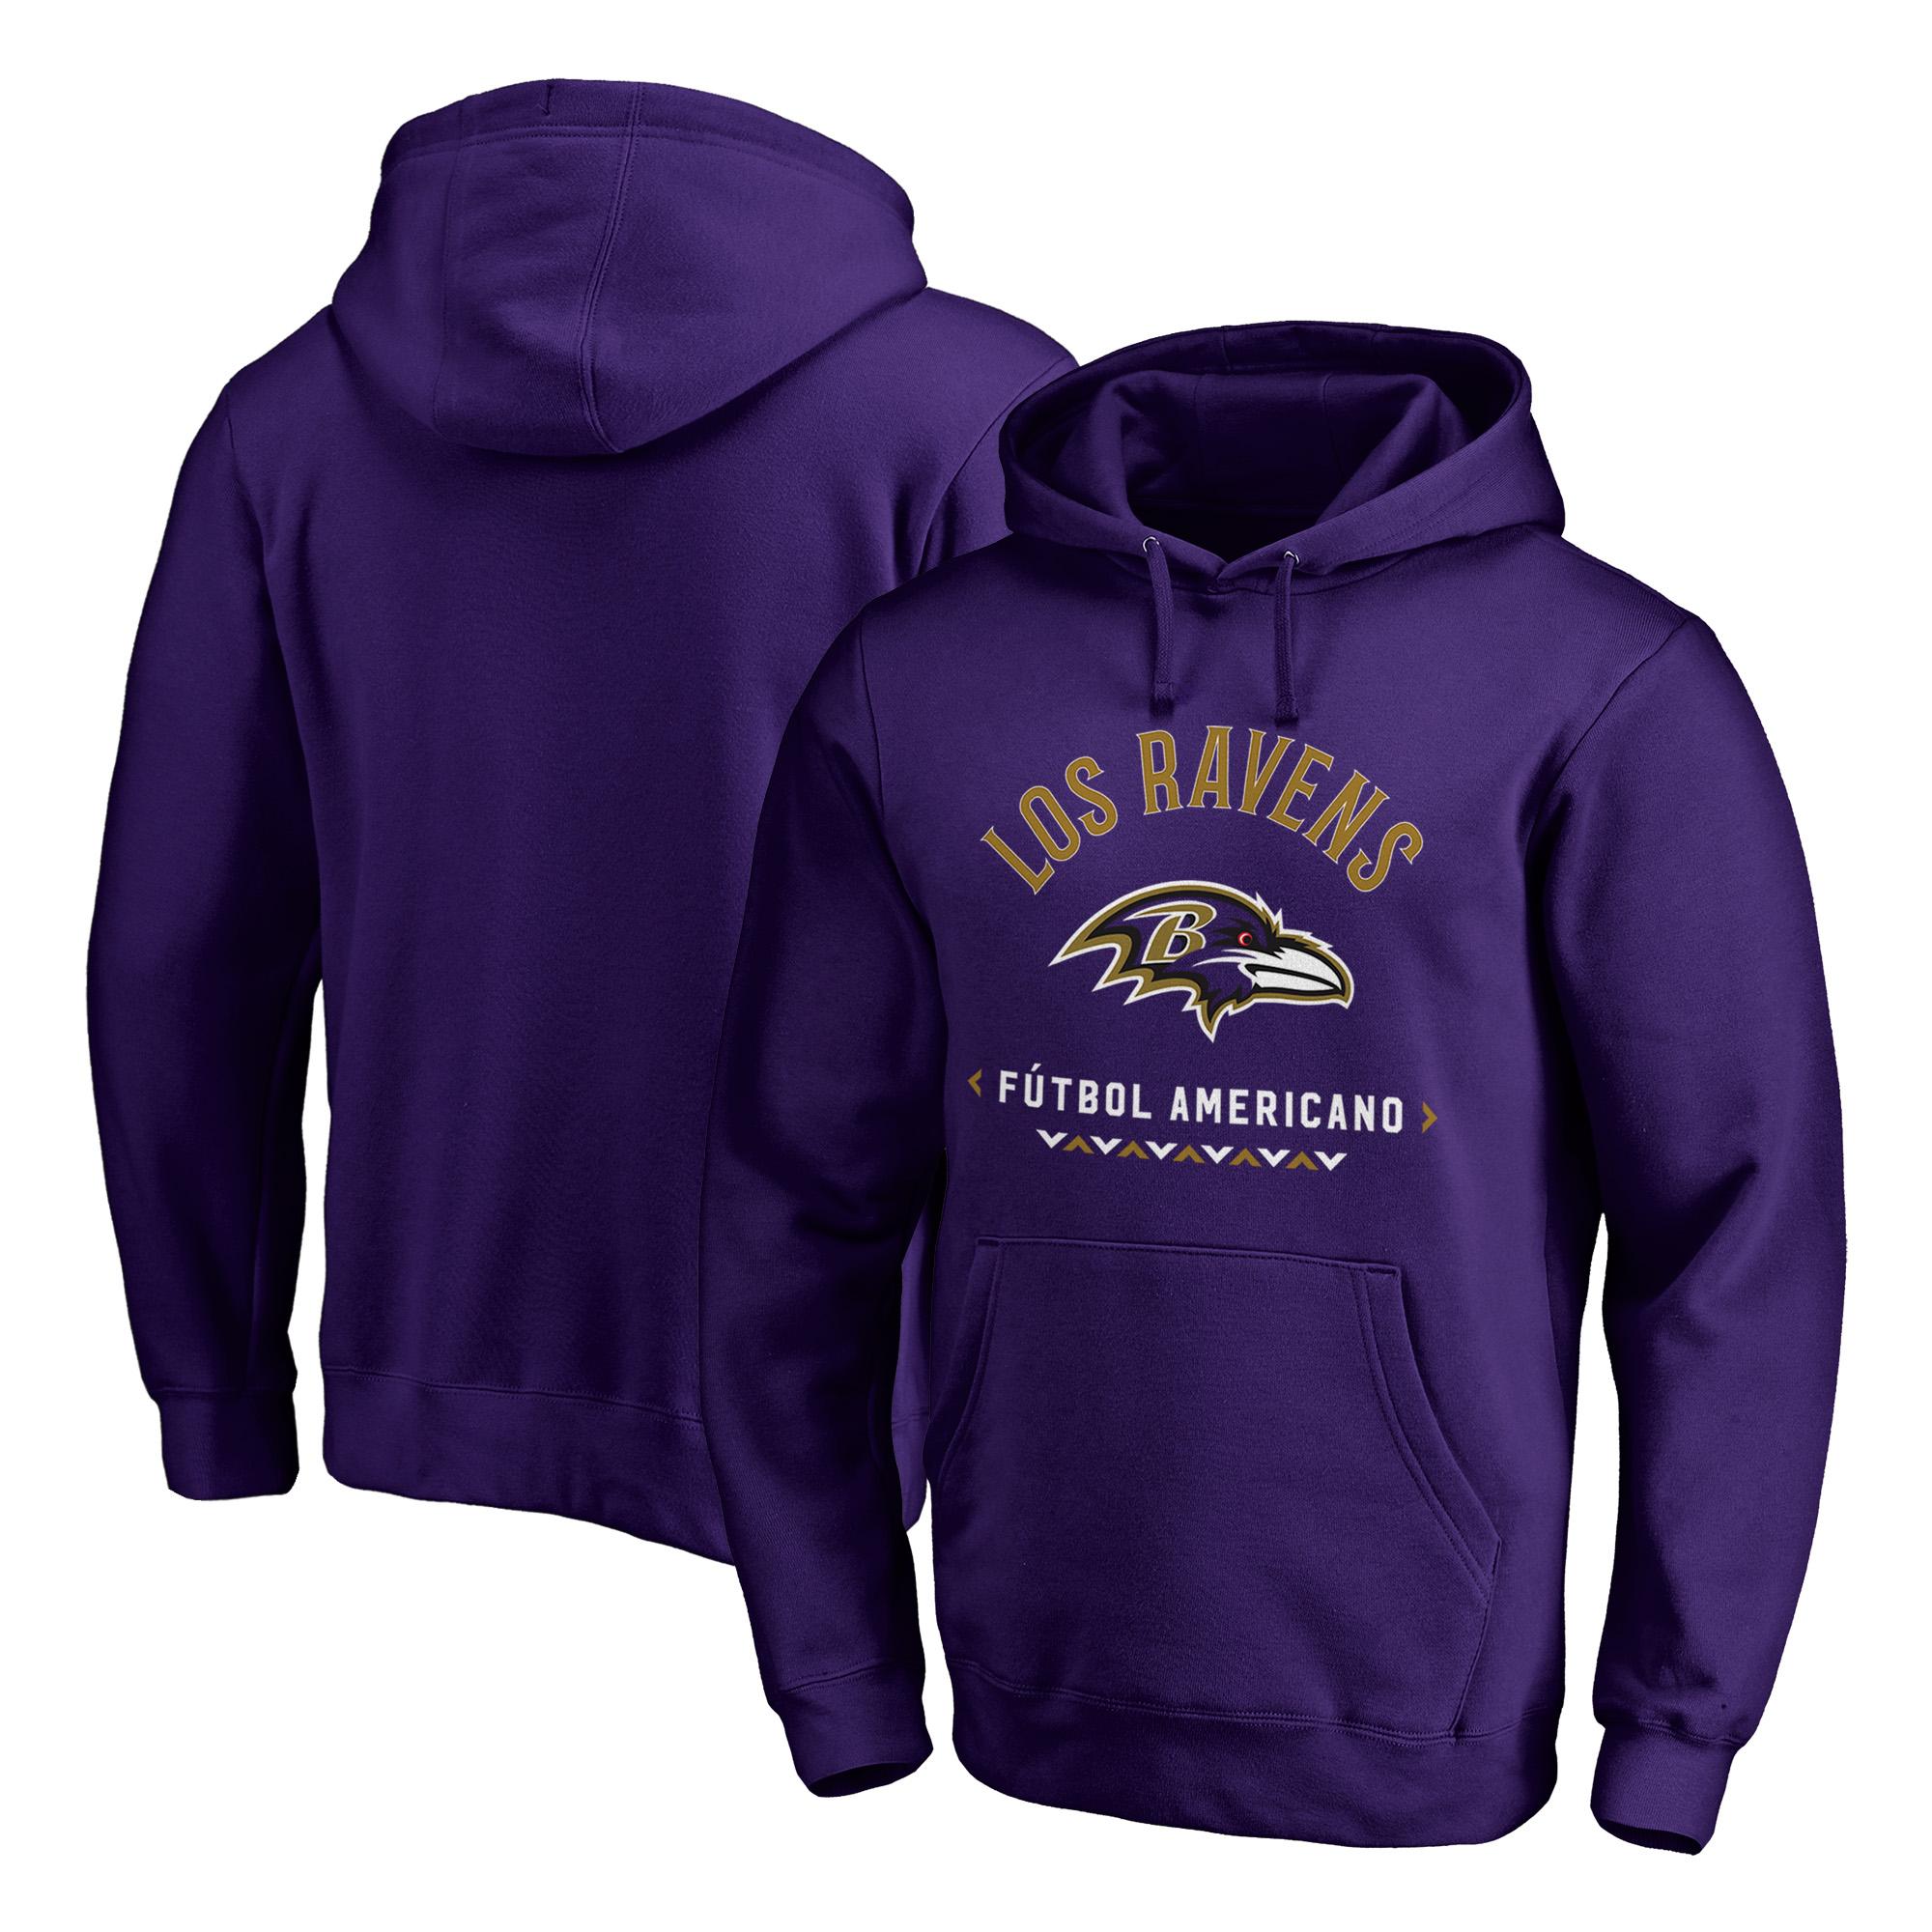 Baltimore Ravens NFL Pro Line by Fanatics Branded Futbol Americano Pullover Hoodie - Purple